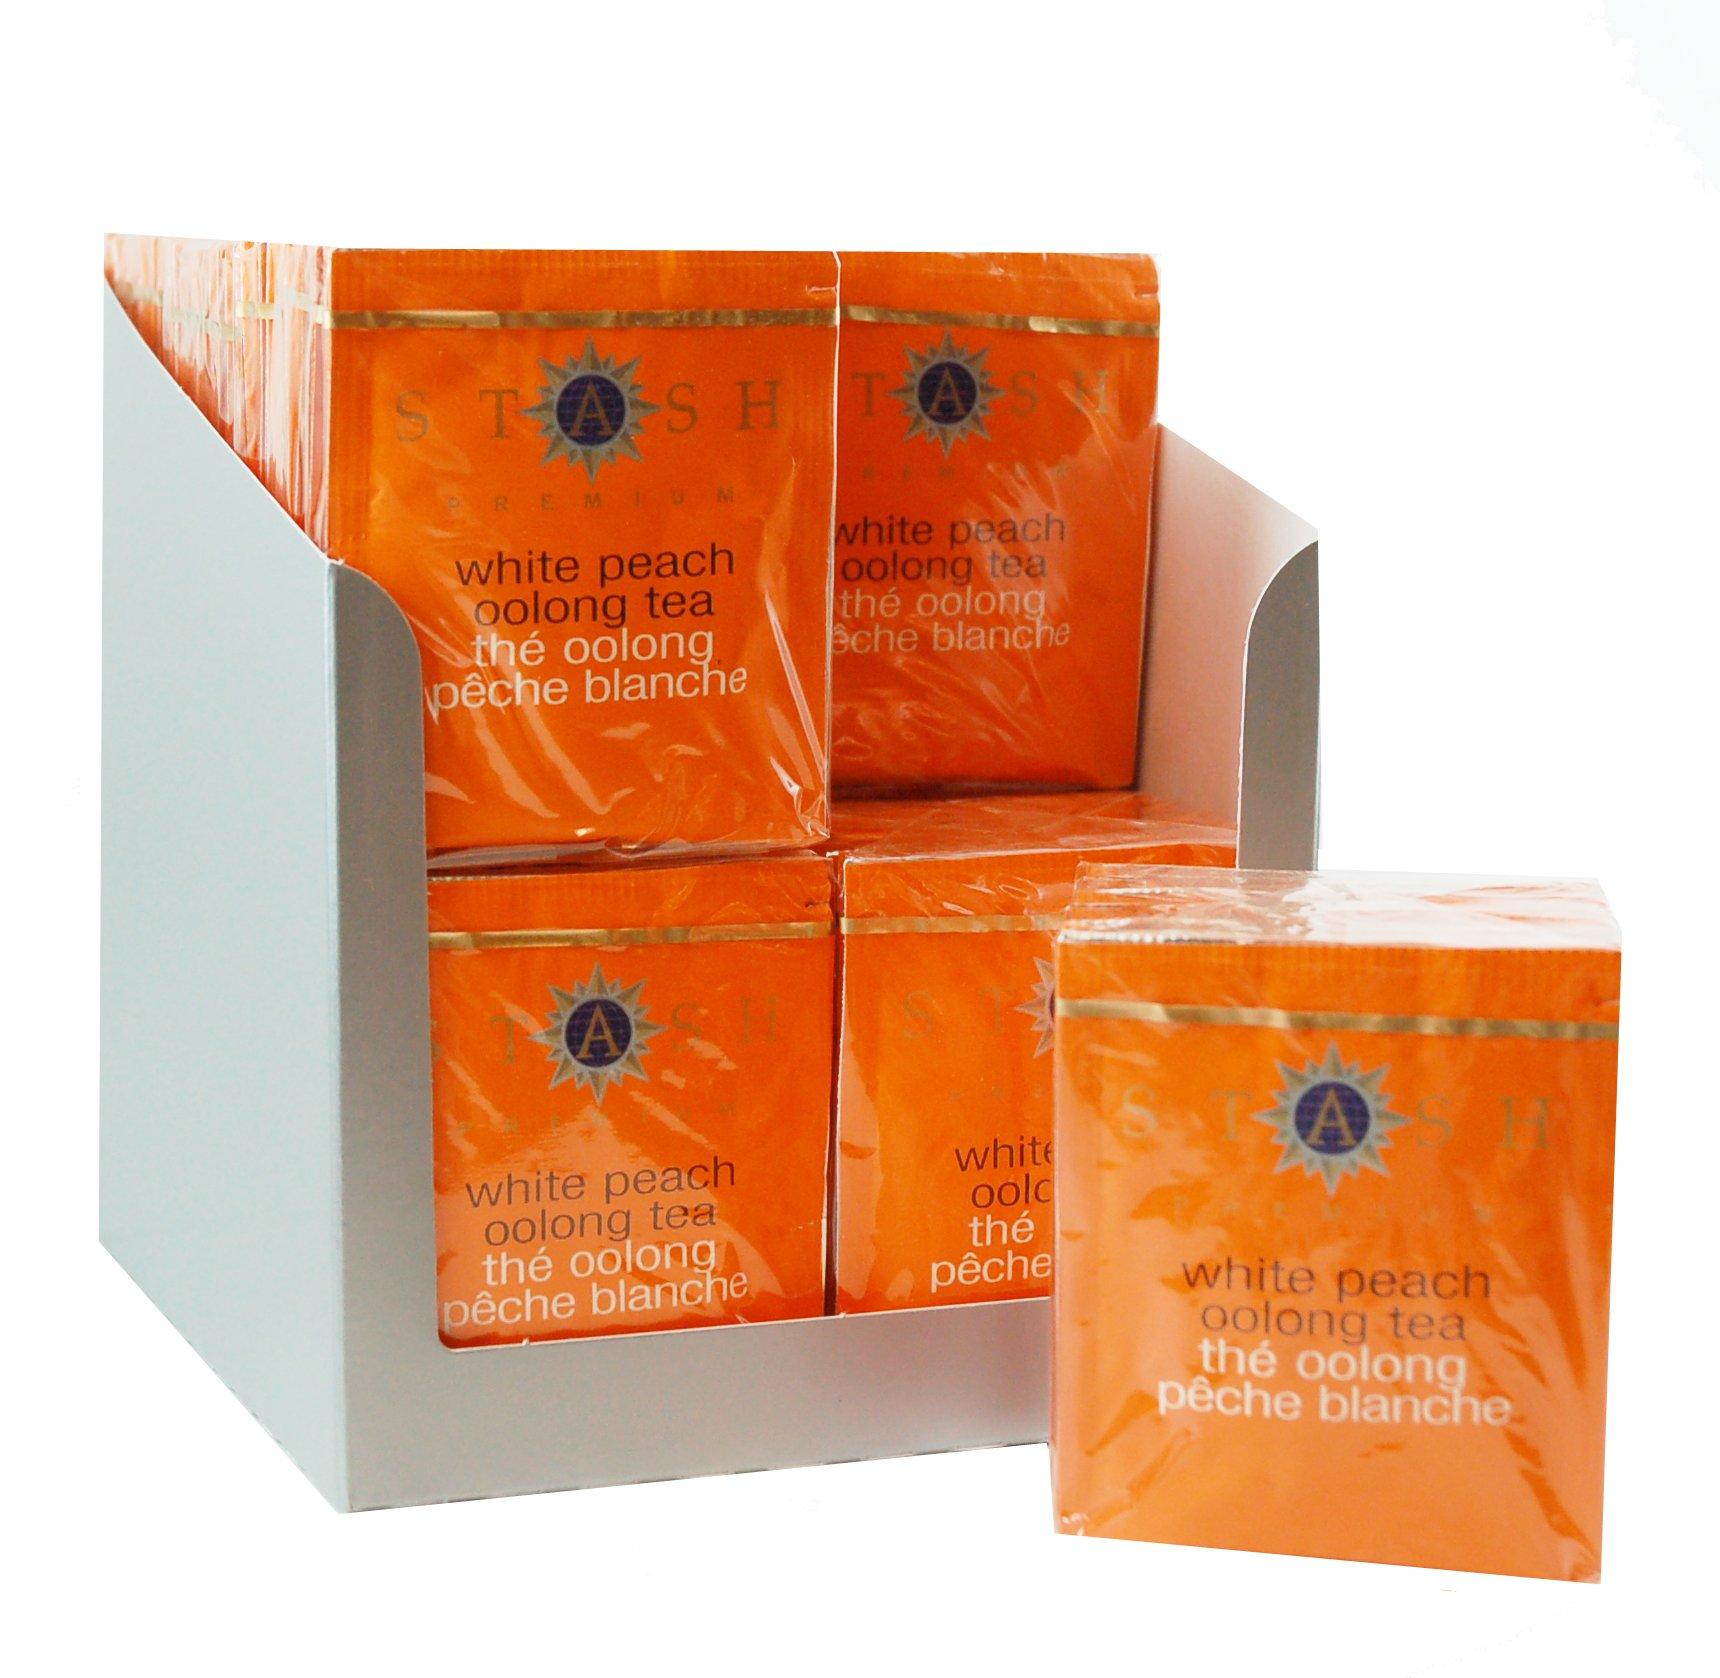 Stash Tea White Peach Oolong Tea 10 Count Tea Bags in Foil (Pack of 12) (packaging may vary) Individual Oolong Black Tea Bags, Use in Teapots Mugs or Cups, Brew Hot Tea or Iced Tea by Stash Tea